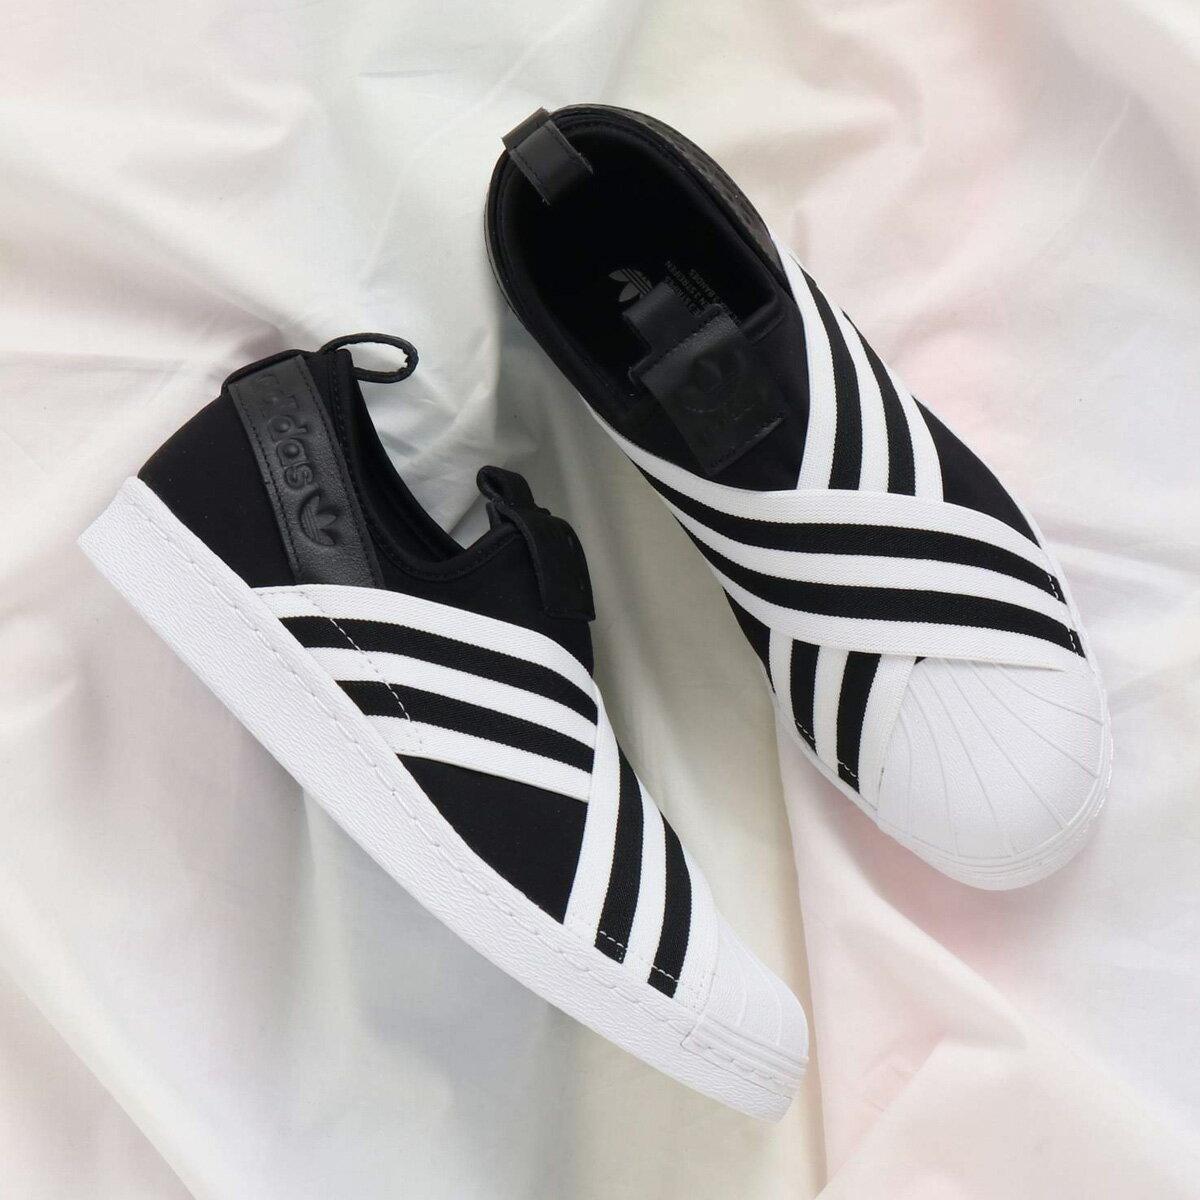 adidas Originals SUPERSTAR SLIPON W(アディダス オリジナルス スーパースタースリッポン W)Core Black/Running White/Running White【メンズ レディース スニーカー】18SS-I